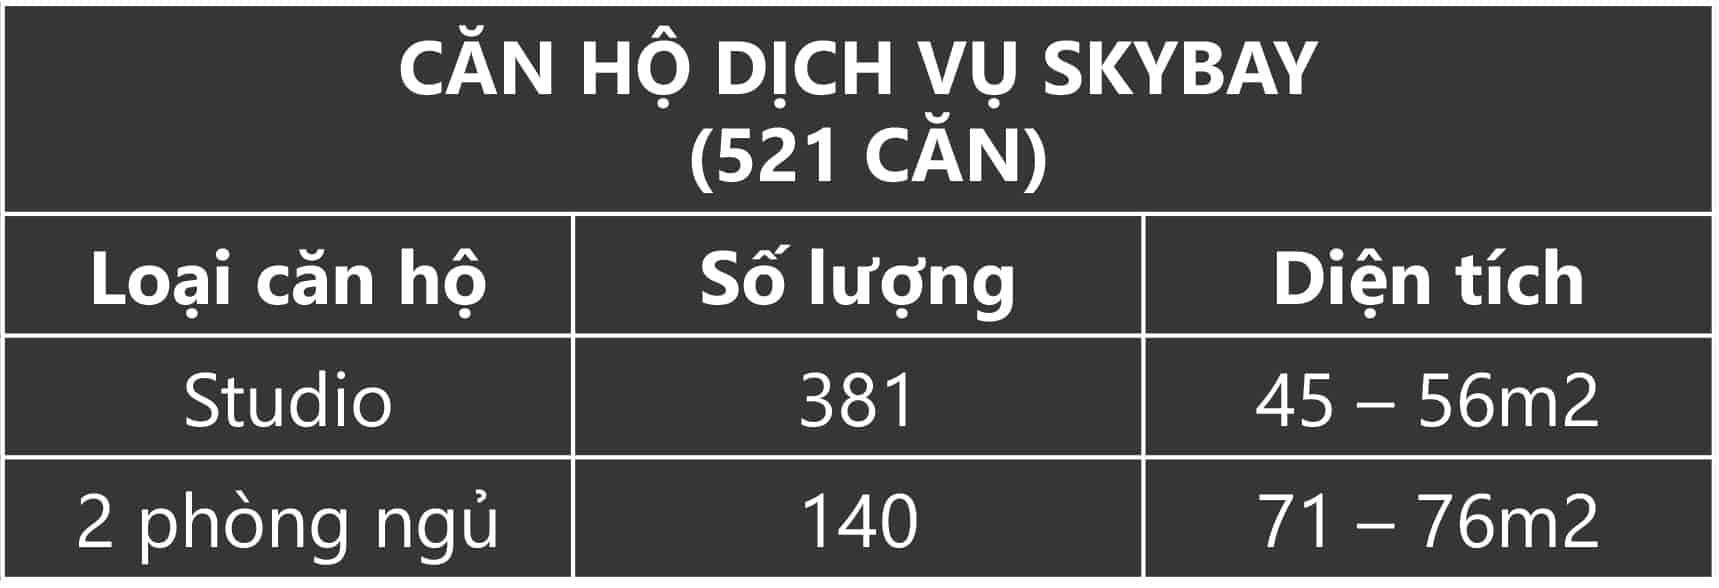 SKY BAY-min